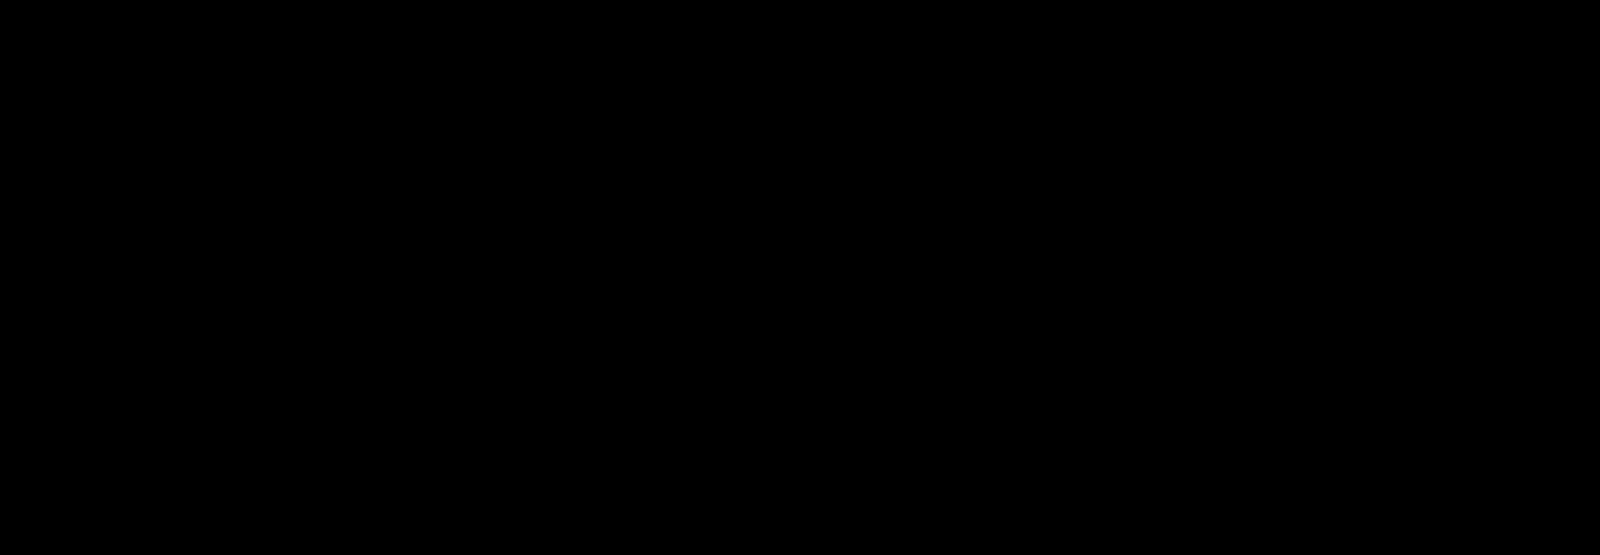 taylorSwift+Font.png